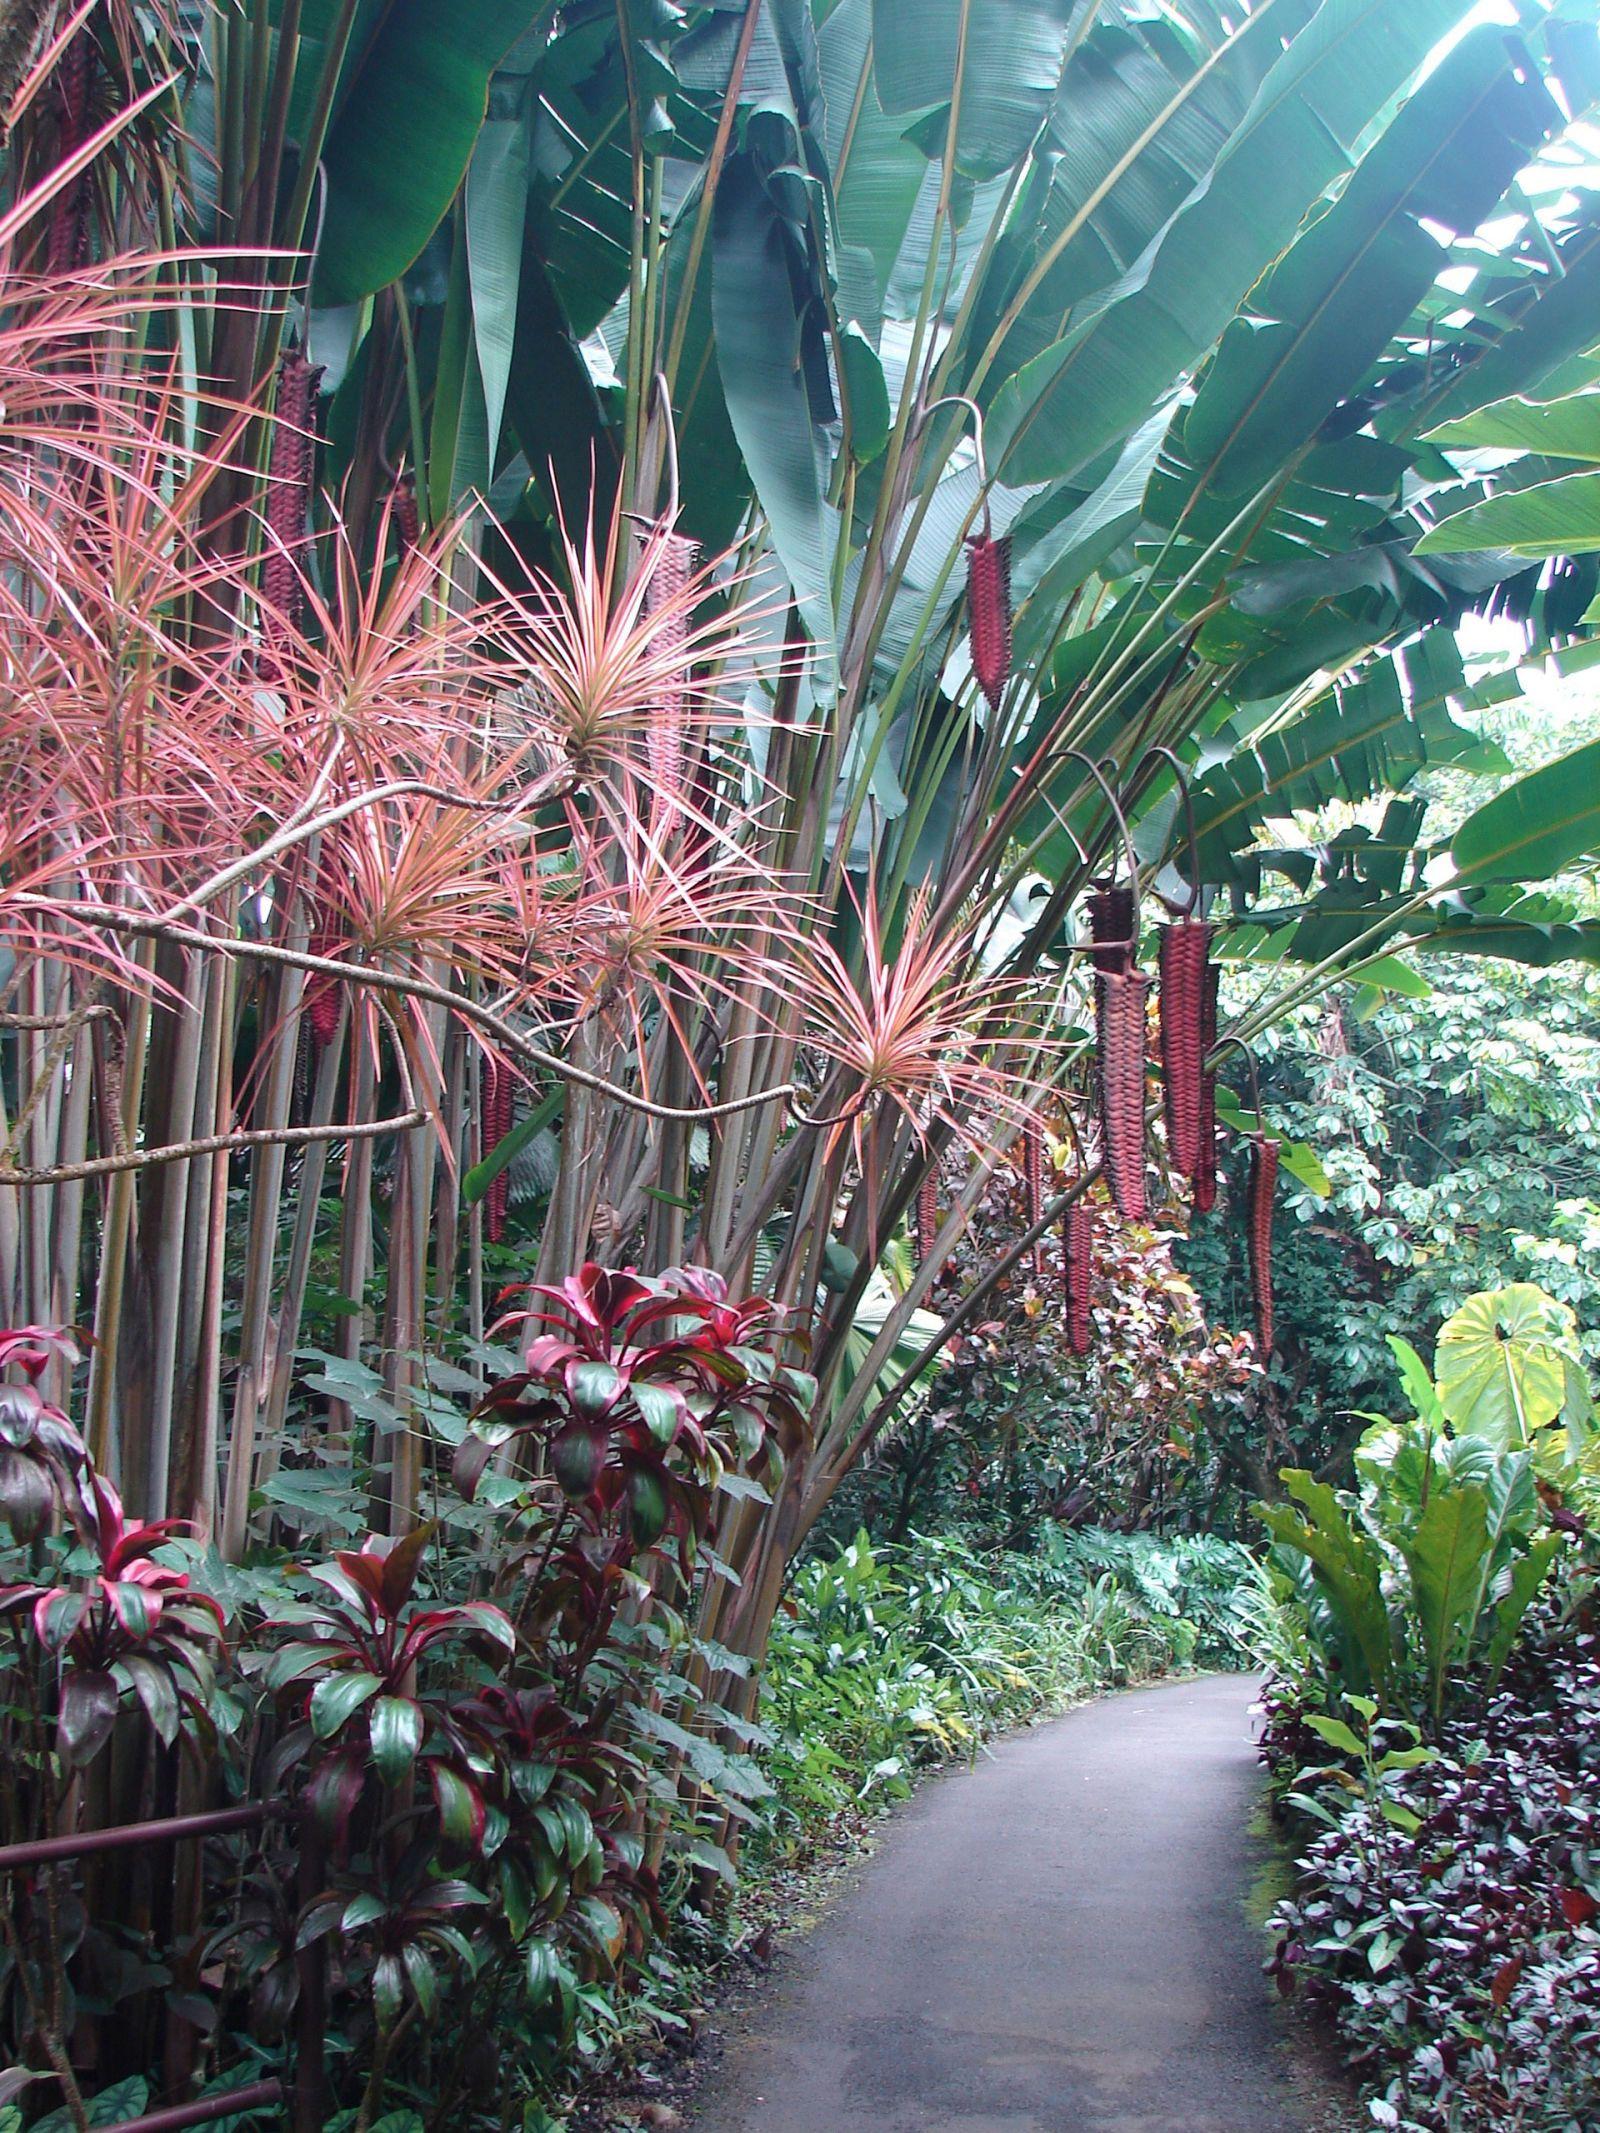 3f1781d9a15046c6281fb4f6cb96d6ca - How Big Is The Botanical Gardens